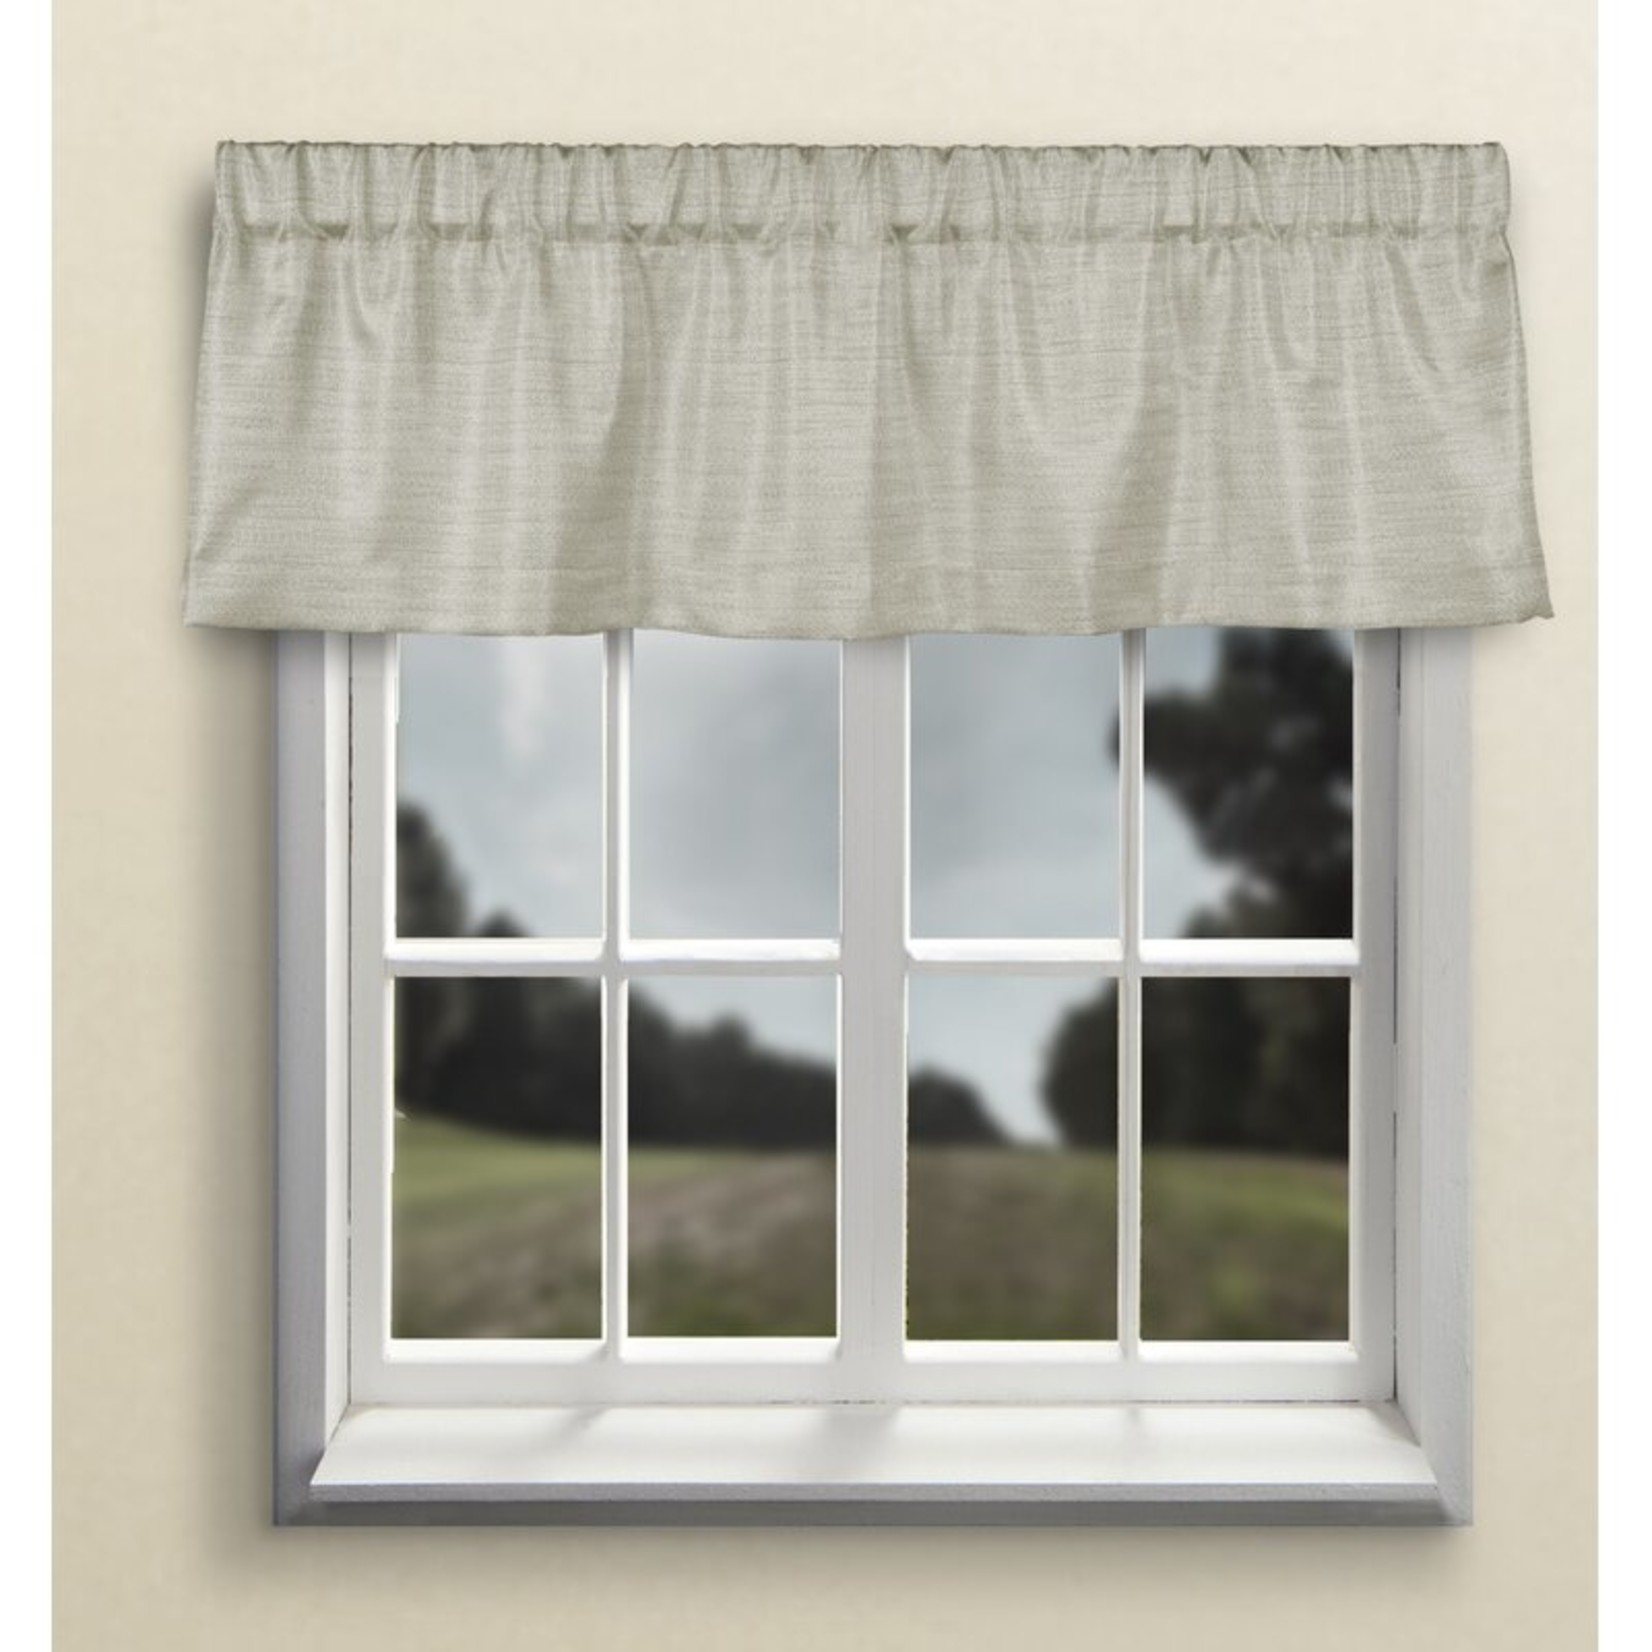 "* 54"" - Jaronda Tailored Window Valance"